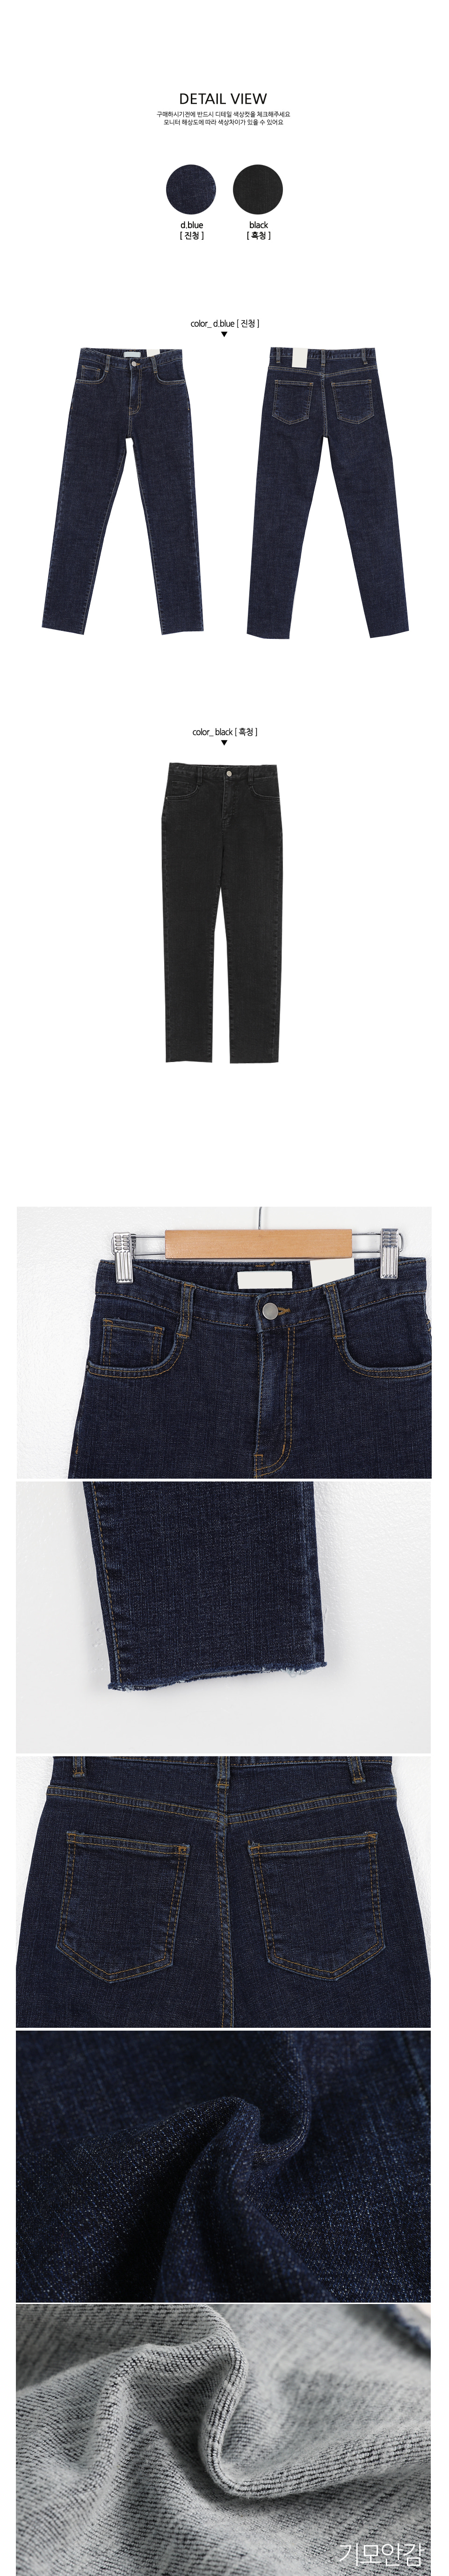 Buff Pants Brushed Date